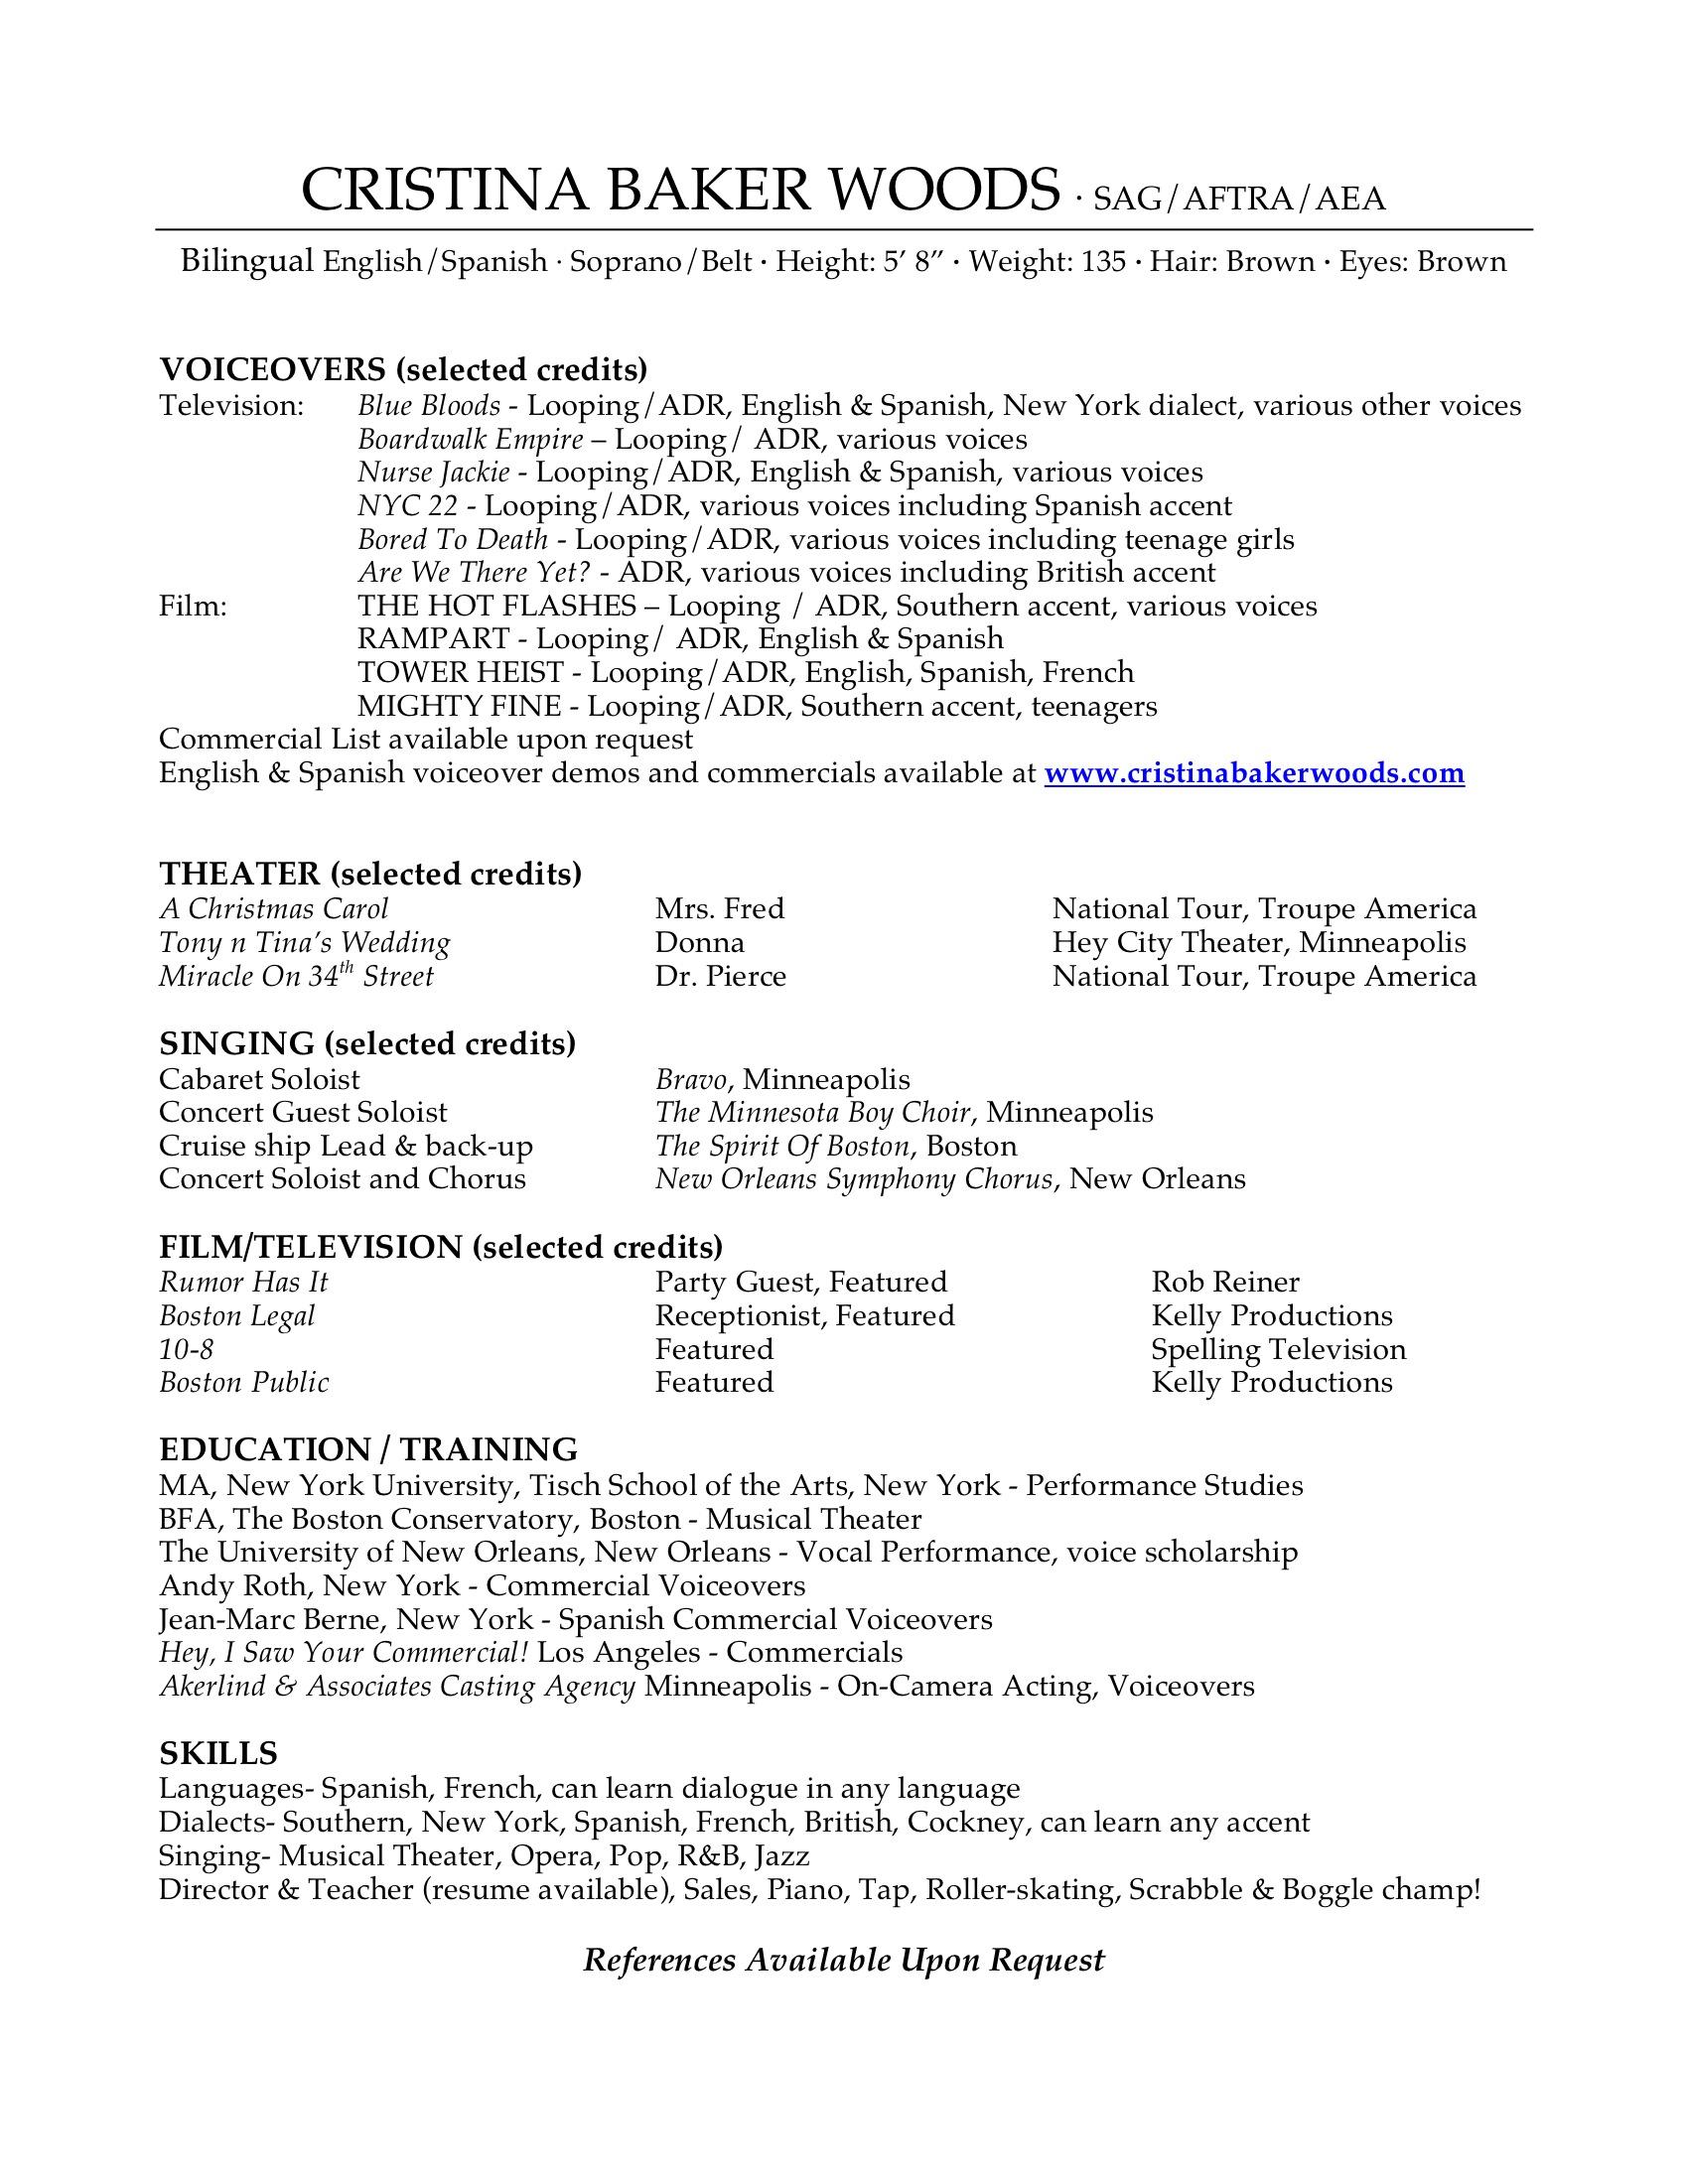 Performer Resume Template. Actor Resume Template Microsoft Word